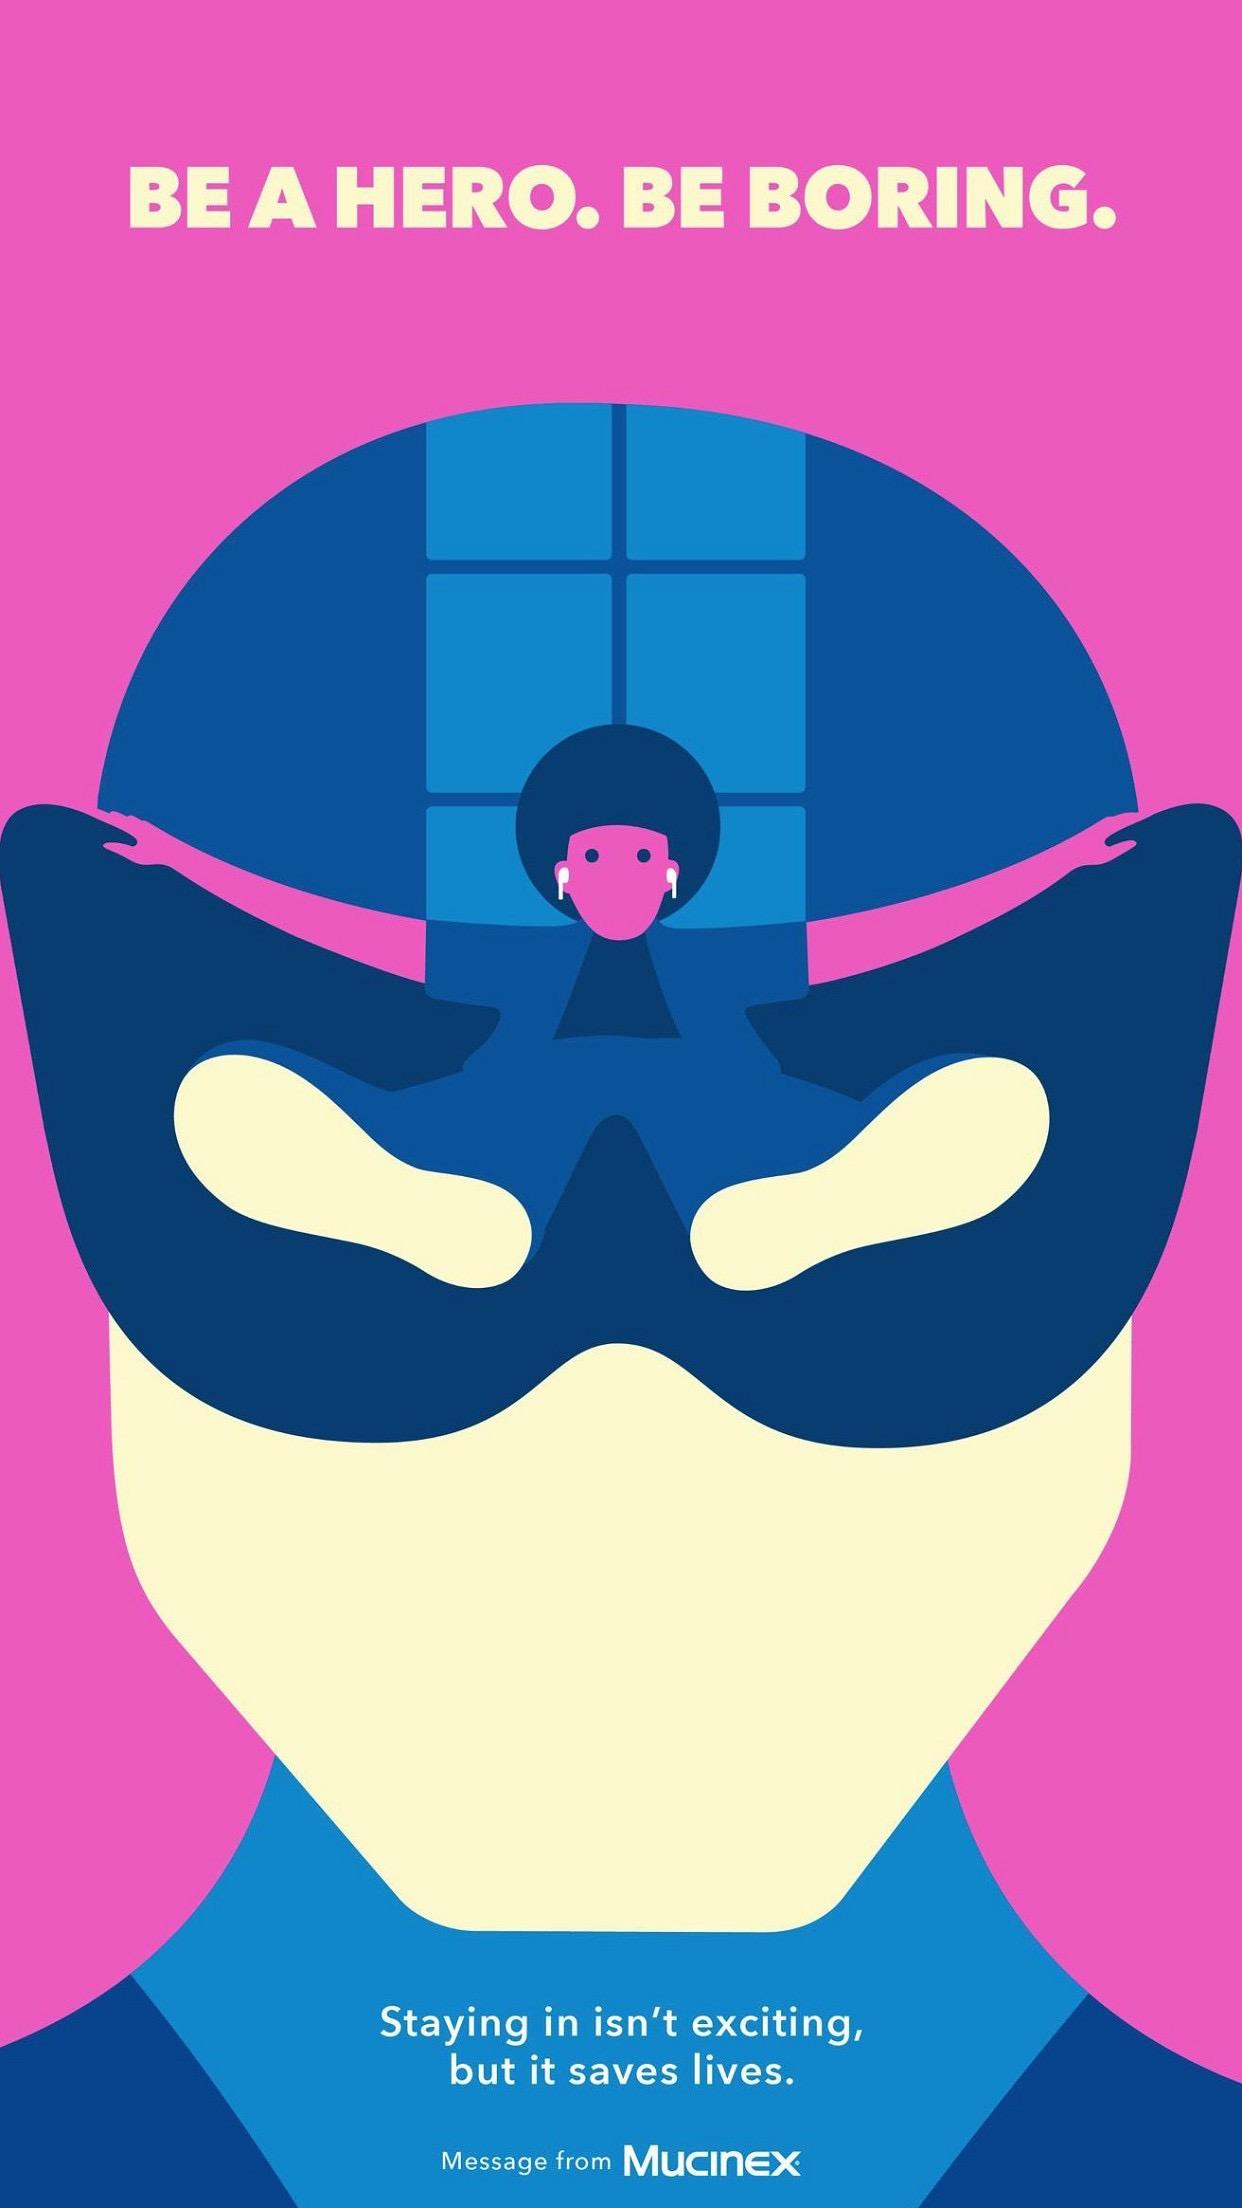 Be a Hero. Be Boring. - 美国制药品牌 Mucinex 创意广告:遵守居家令,人人都是「无聊的」英雄